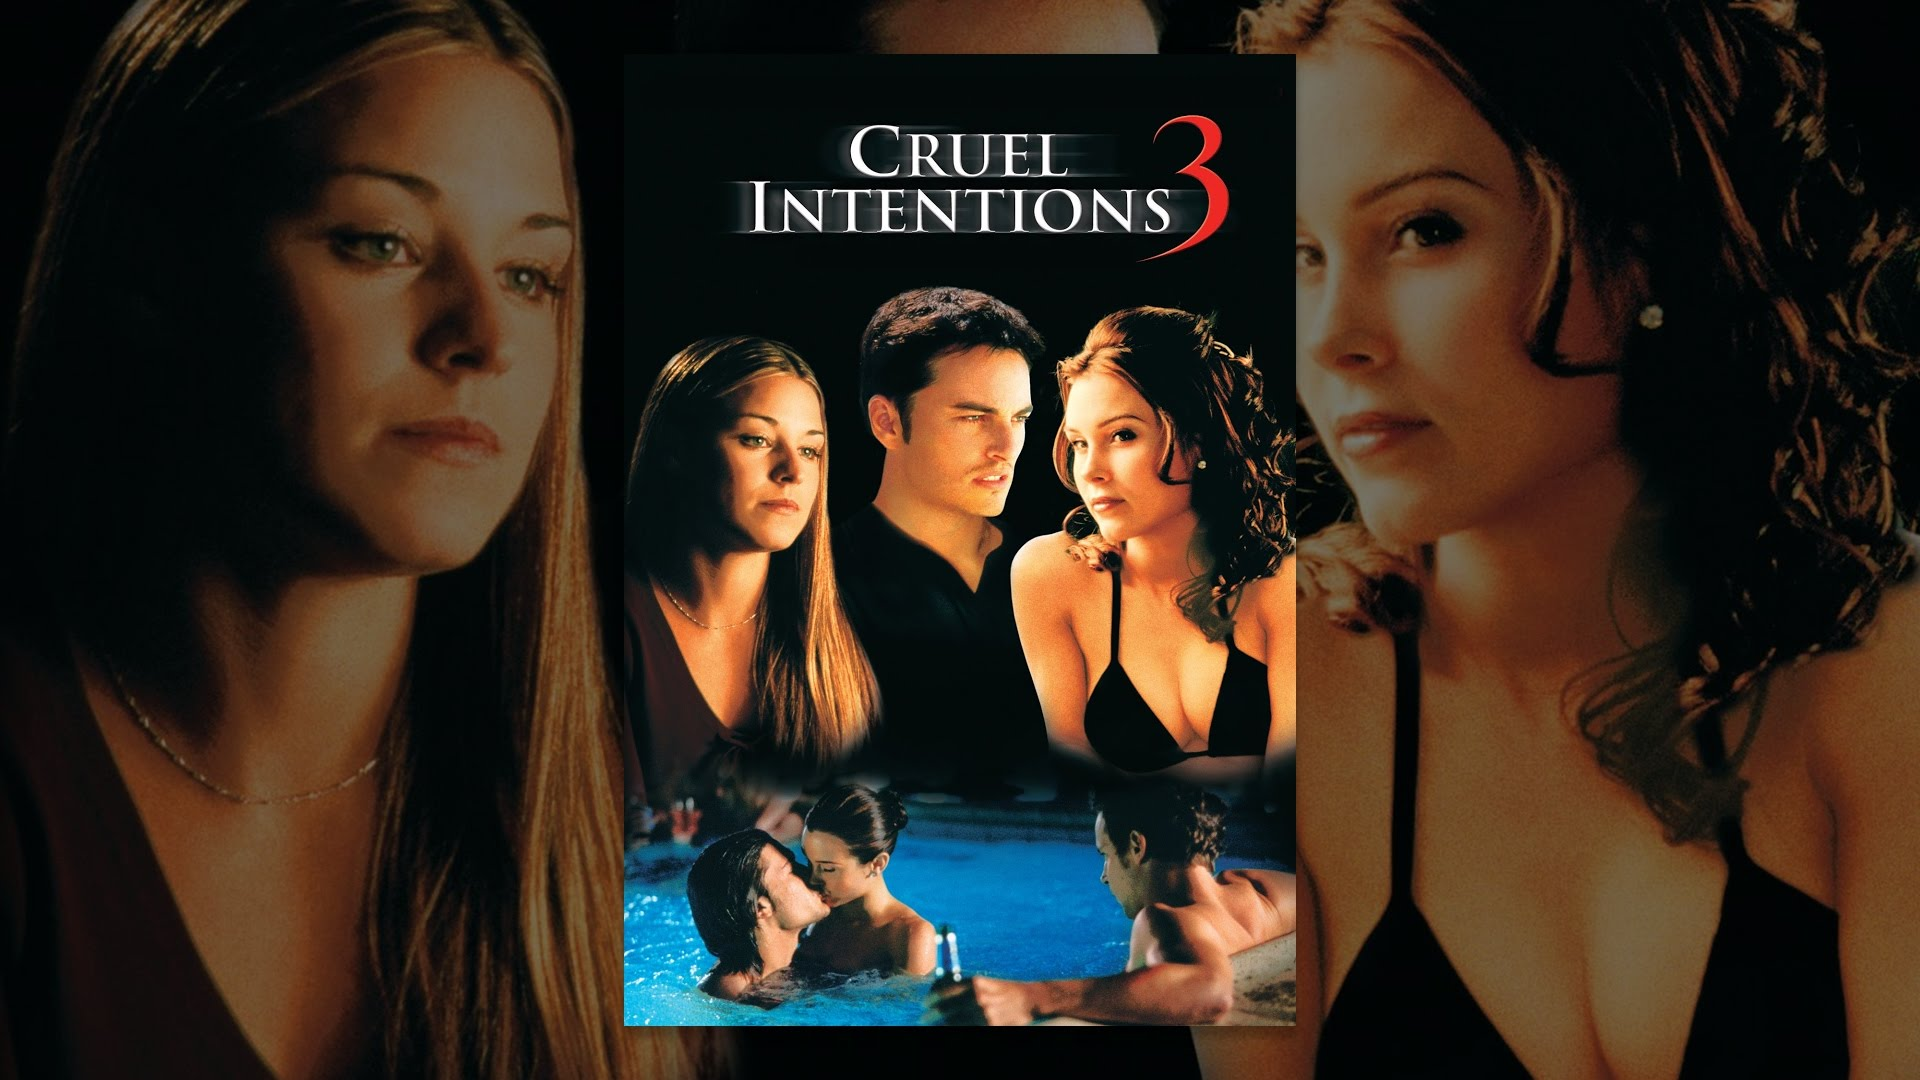 Cruel Intentions 3 - YouTube